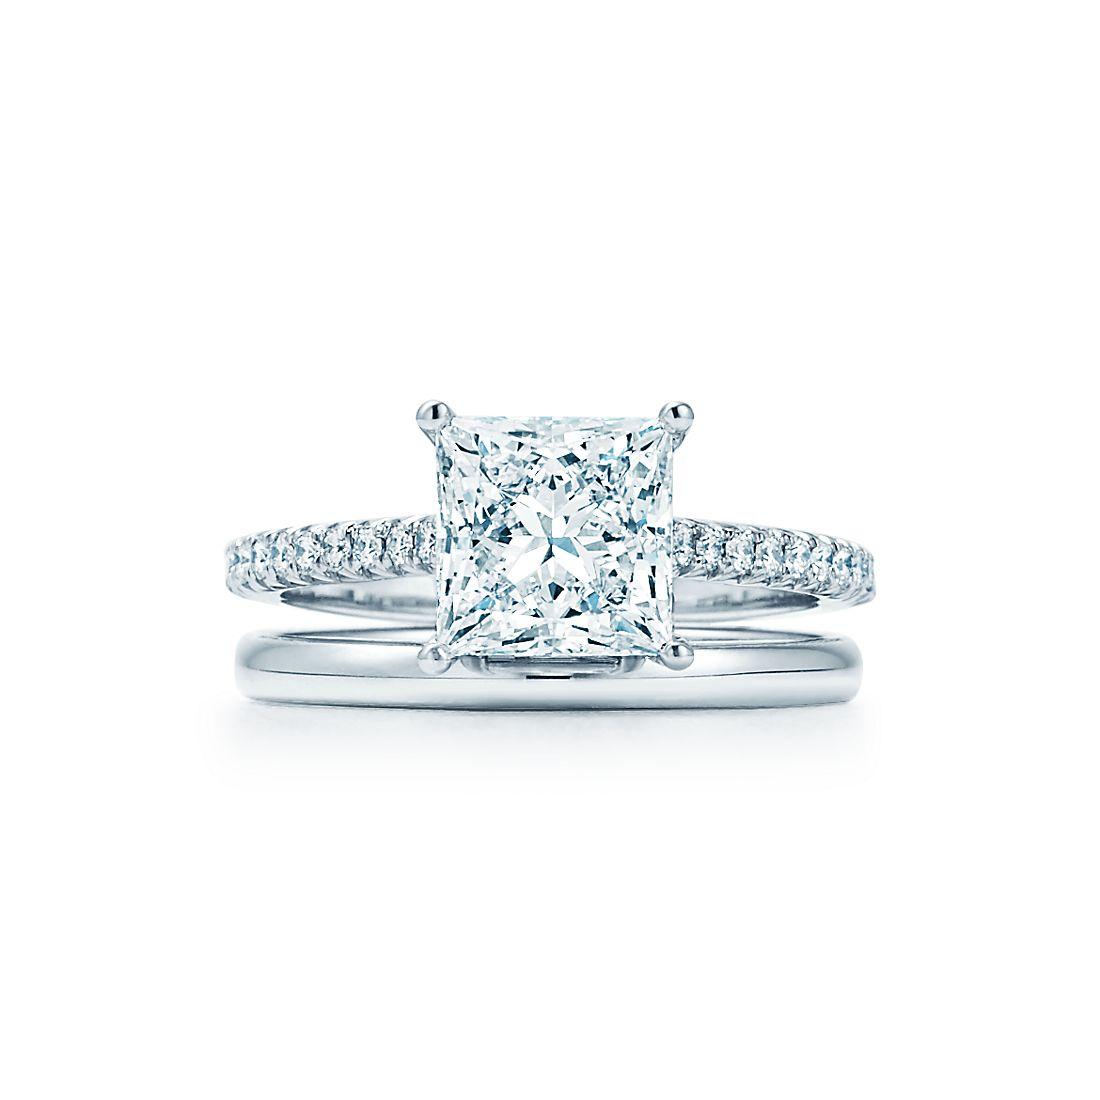 083b88288bc04 Tiffany Novo®  Princess Cut Engagement Ring with Pavé-set diamond ...